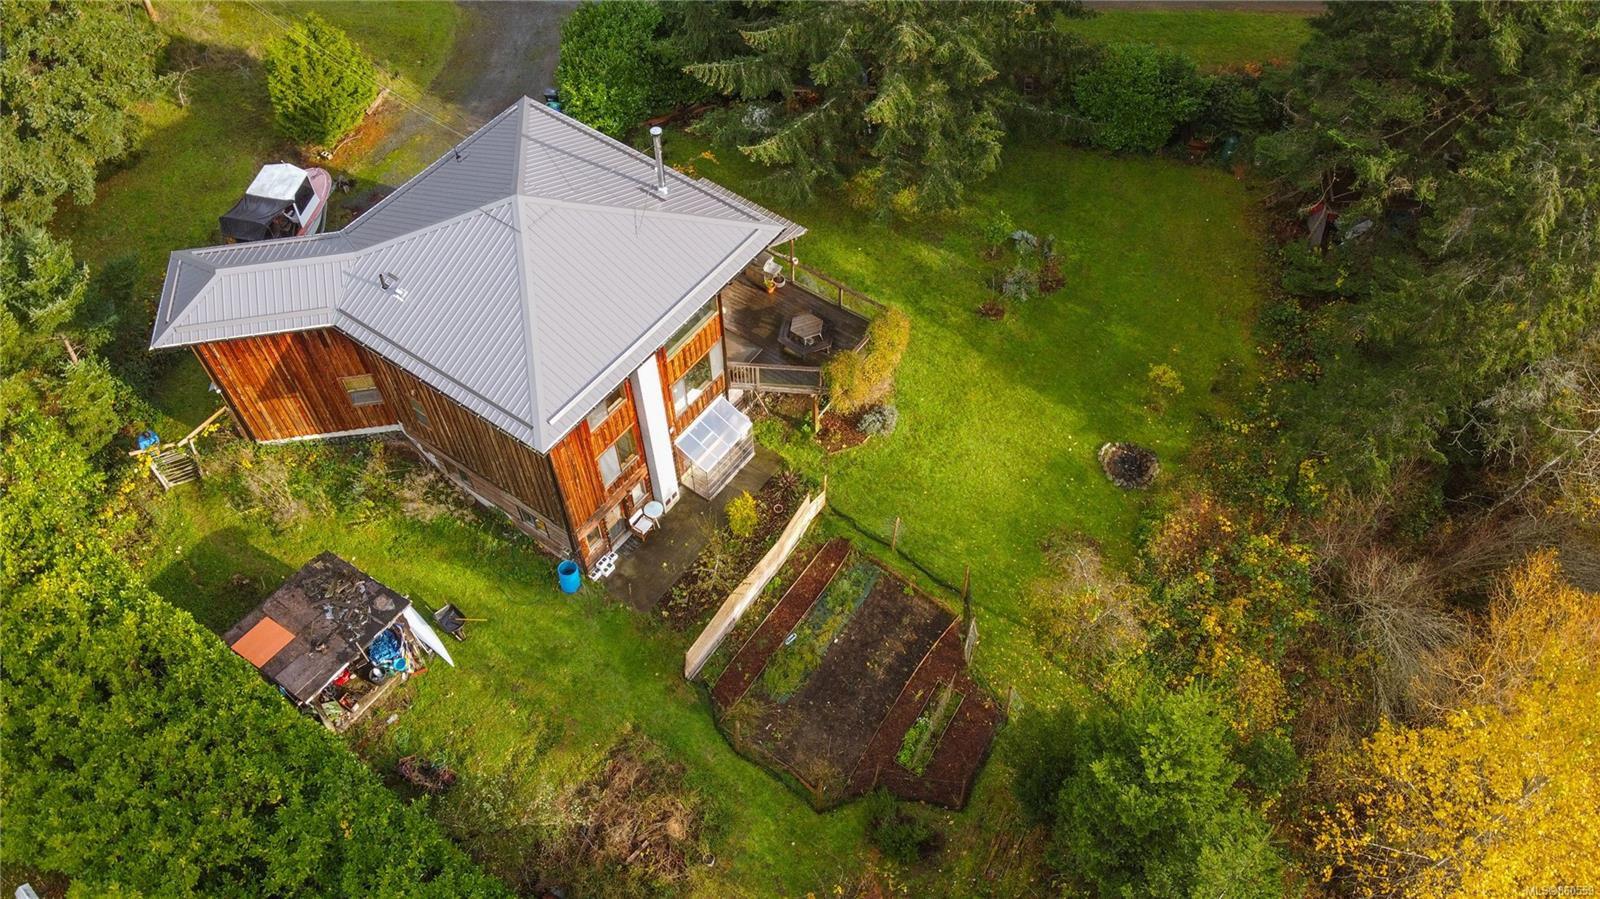 Main Photo: 1915 Stokes Rd in : Isl Gabriola Island House for sale (Islands)  : MLS®# 860559